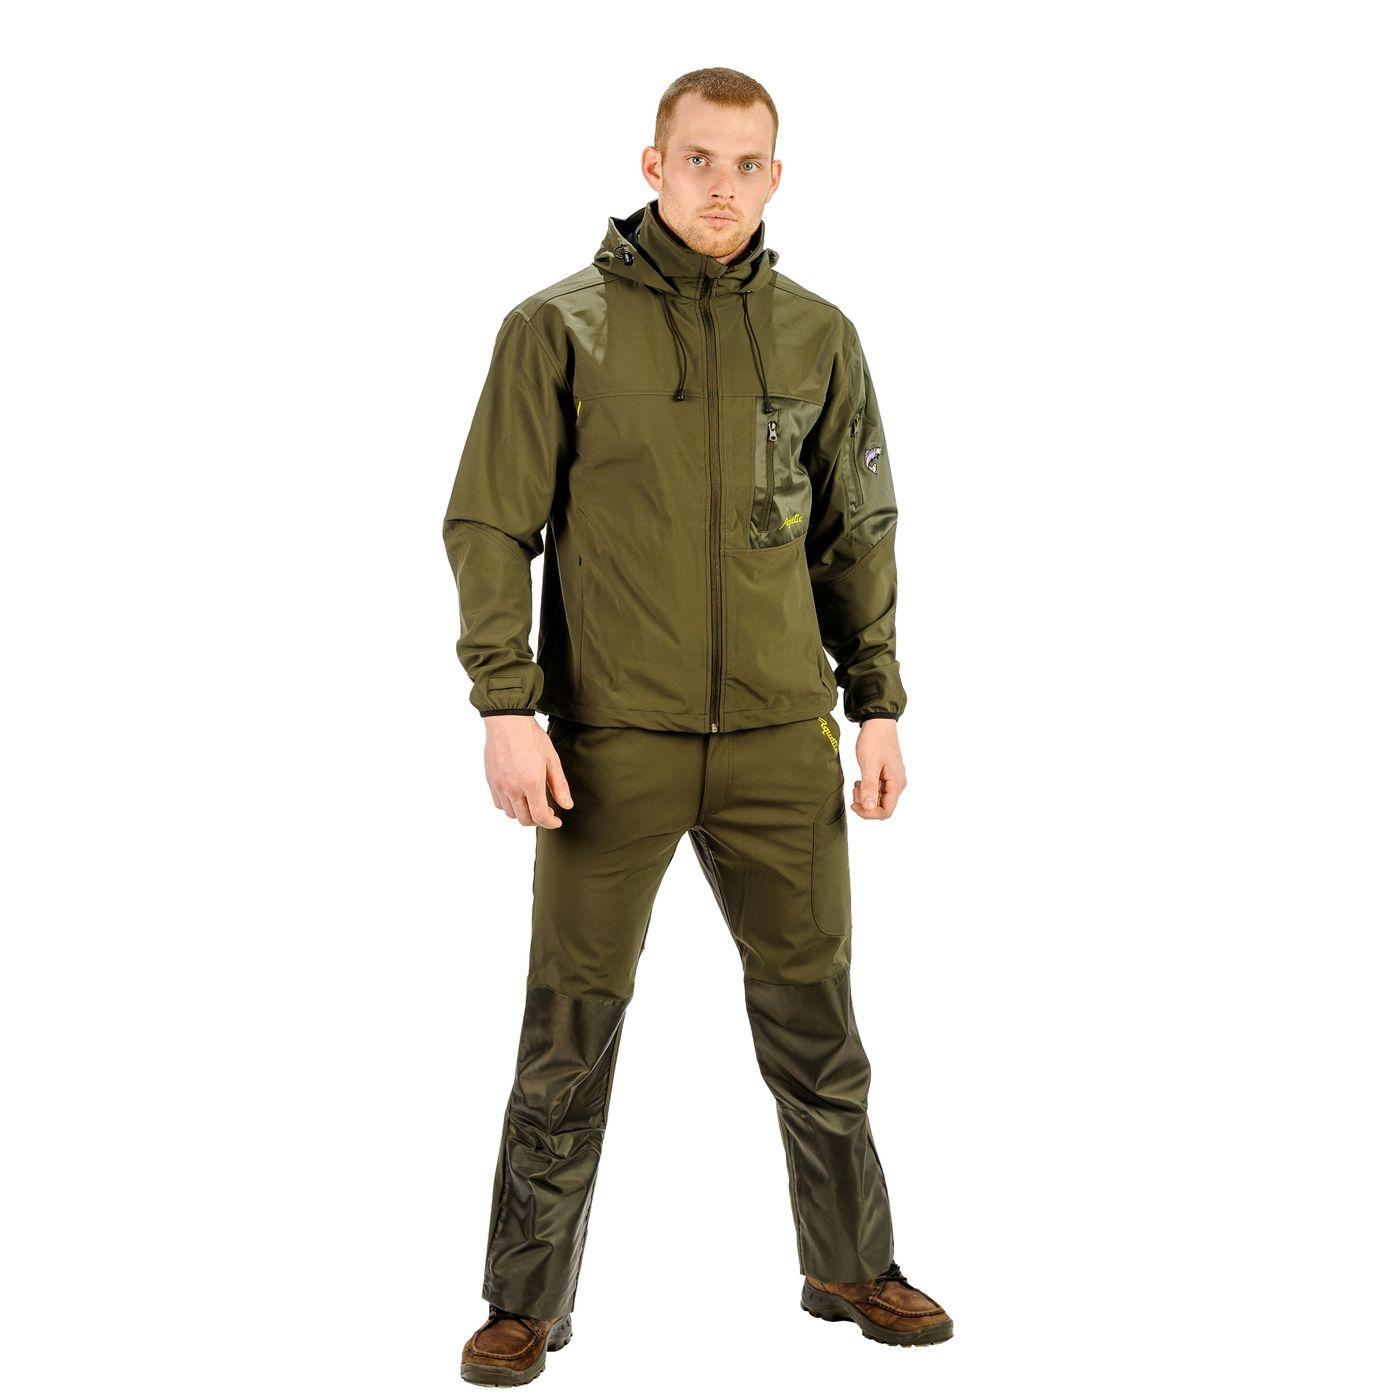 Jacket Thin Aquatic Kk-01 Softshell, Logo Hunting Kk-01 About M